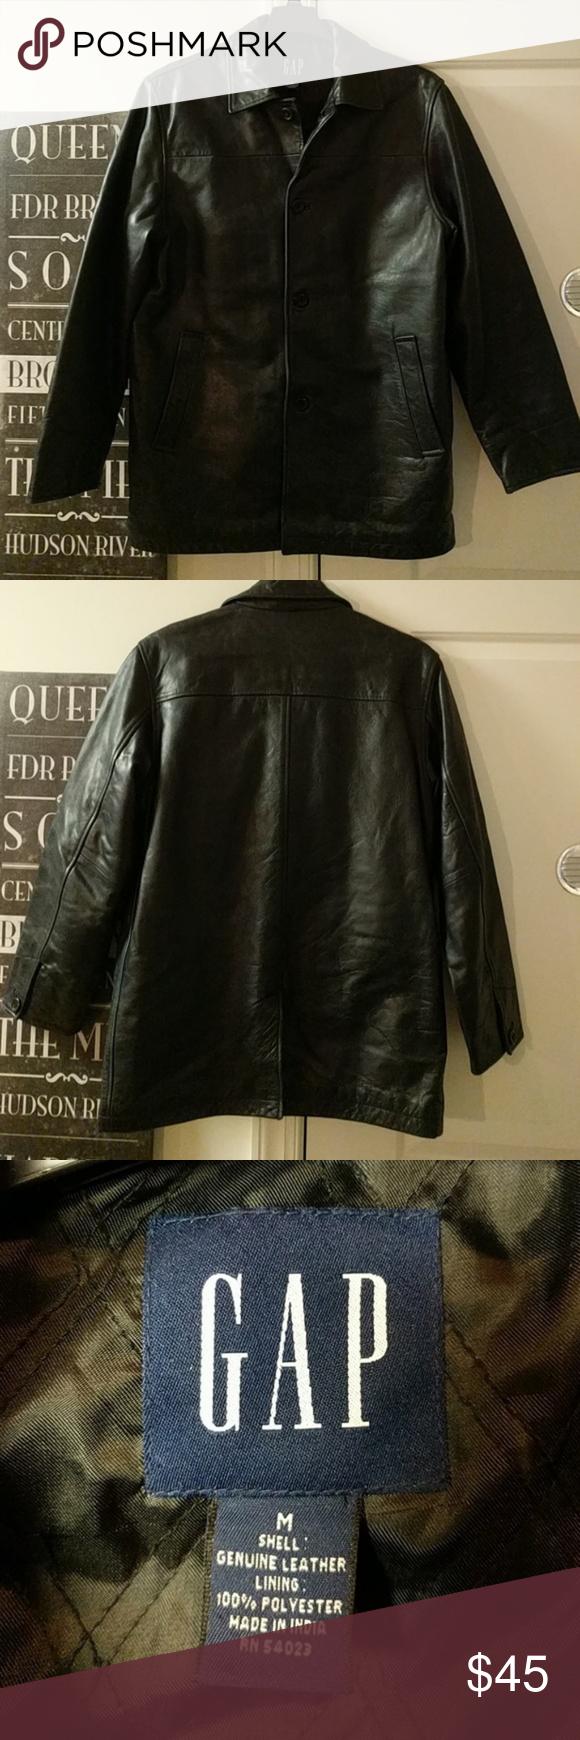 Vintage Gap Mens Leather Coat Mens Leather Coats Leather Coat Leather Men [ 1740 x 580 Pixel ]